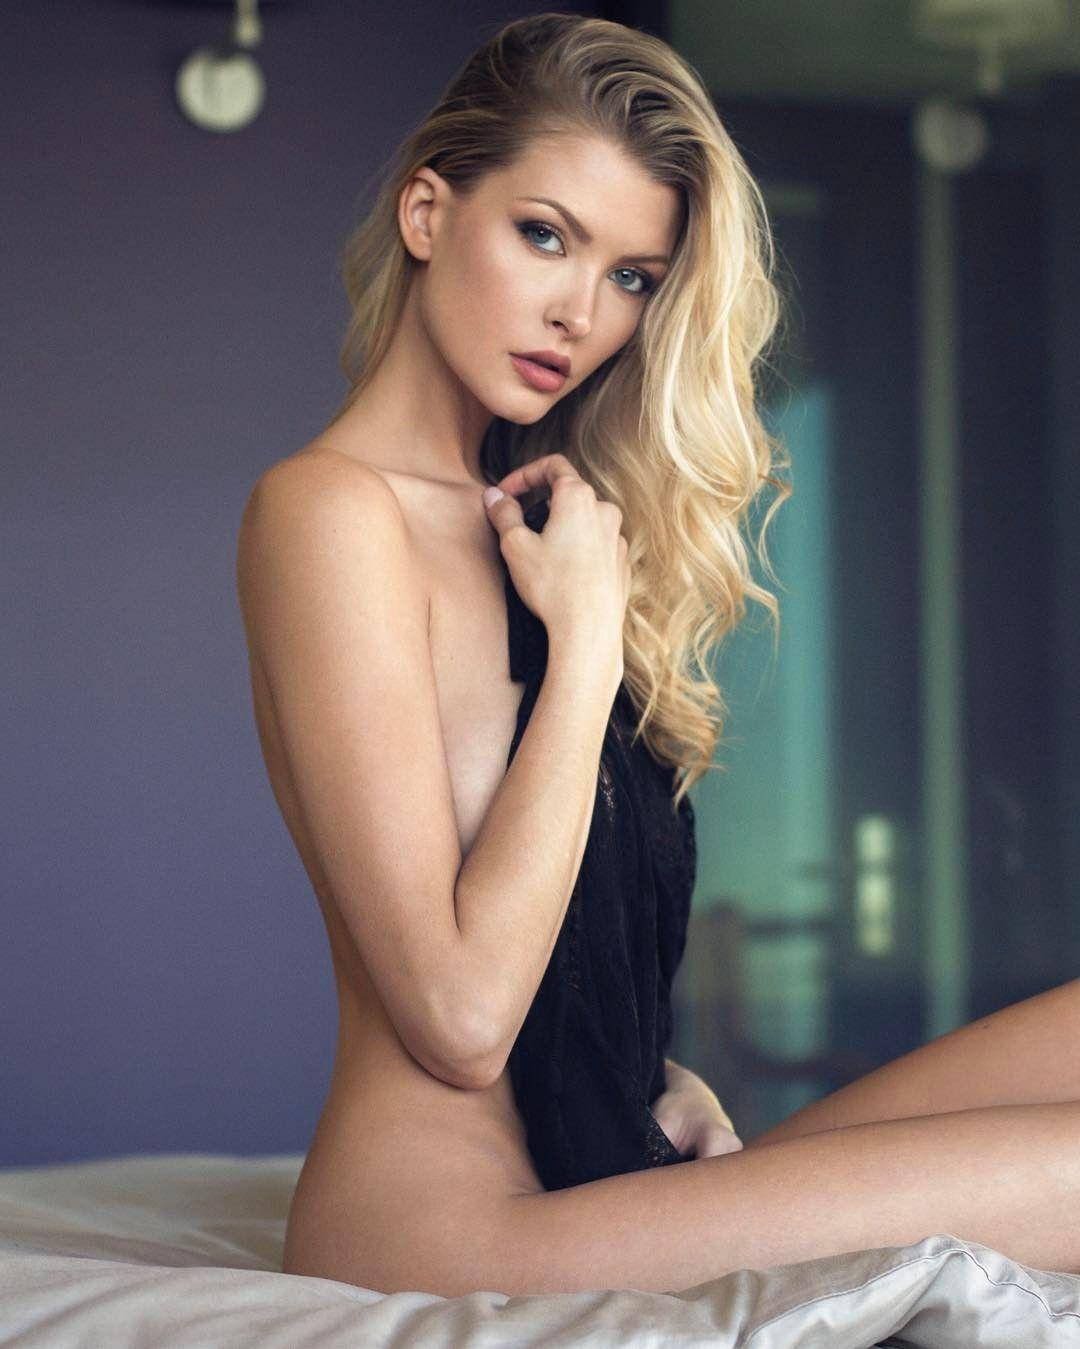 Erin Cummins photos